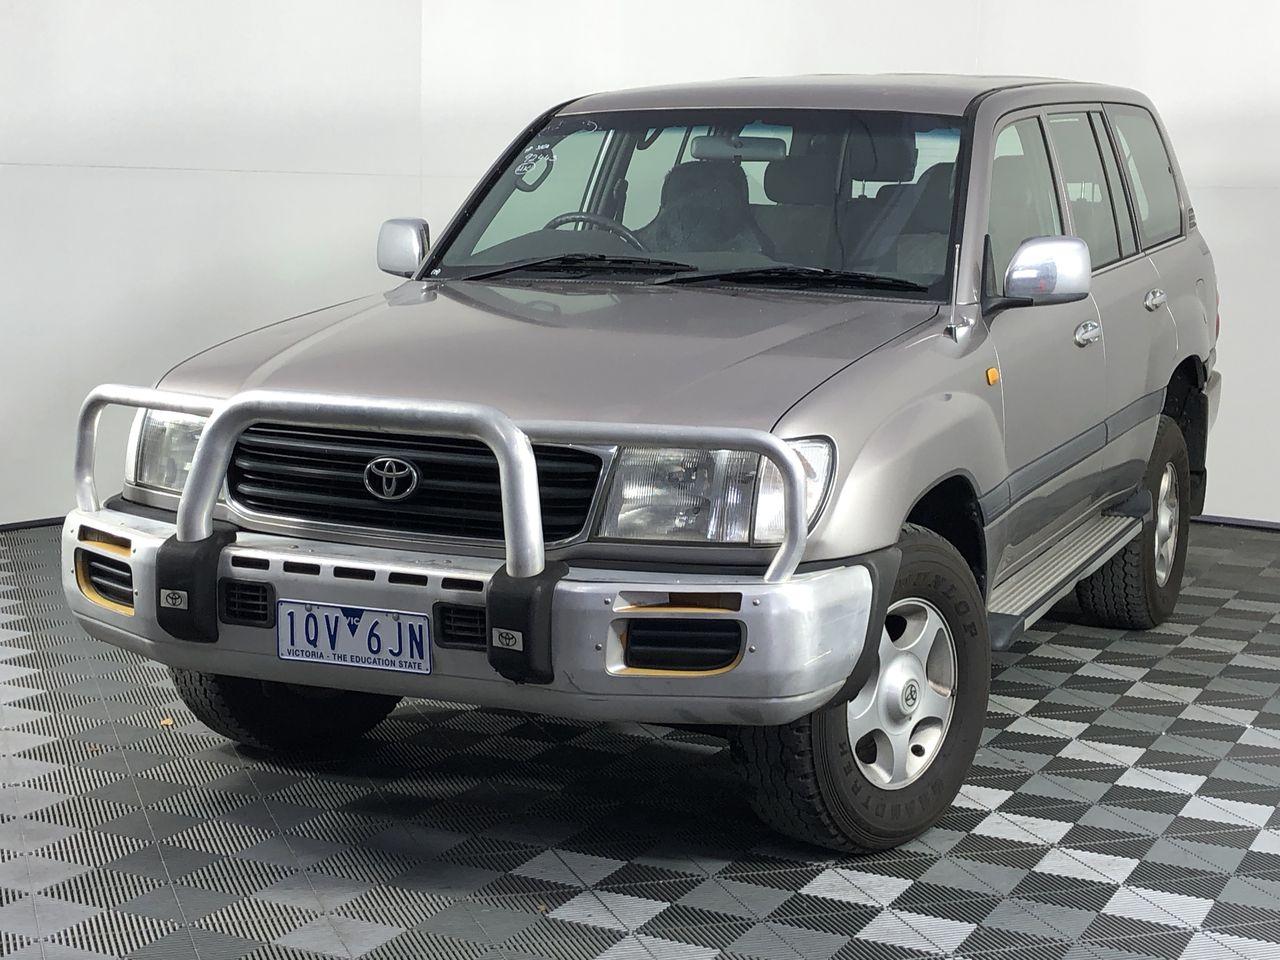 2001 Toyota Landcruiser GXL (4x4) HDJ100R T/D Auto 8 Seat Wagon (RWC 25/11)